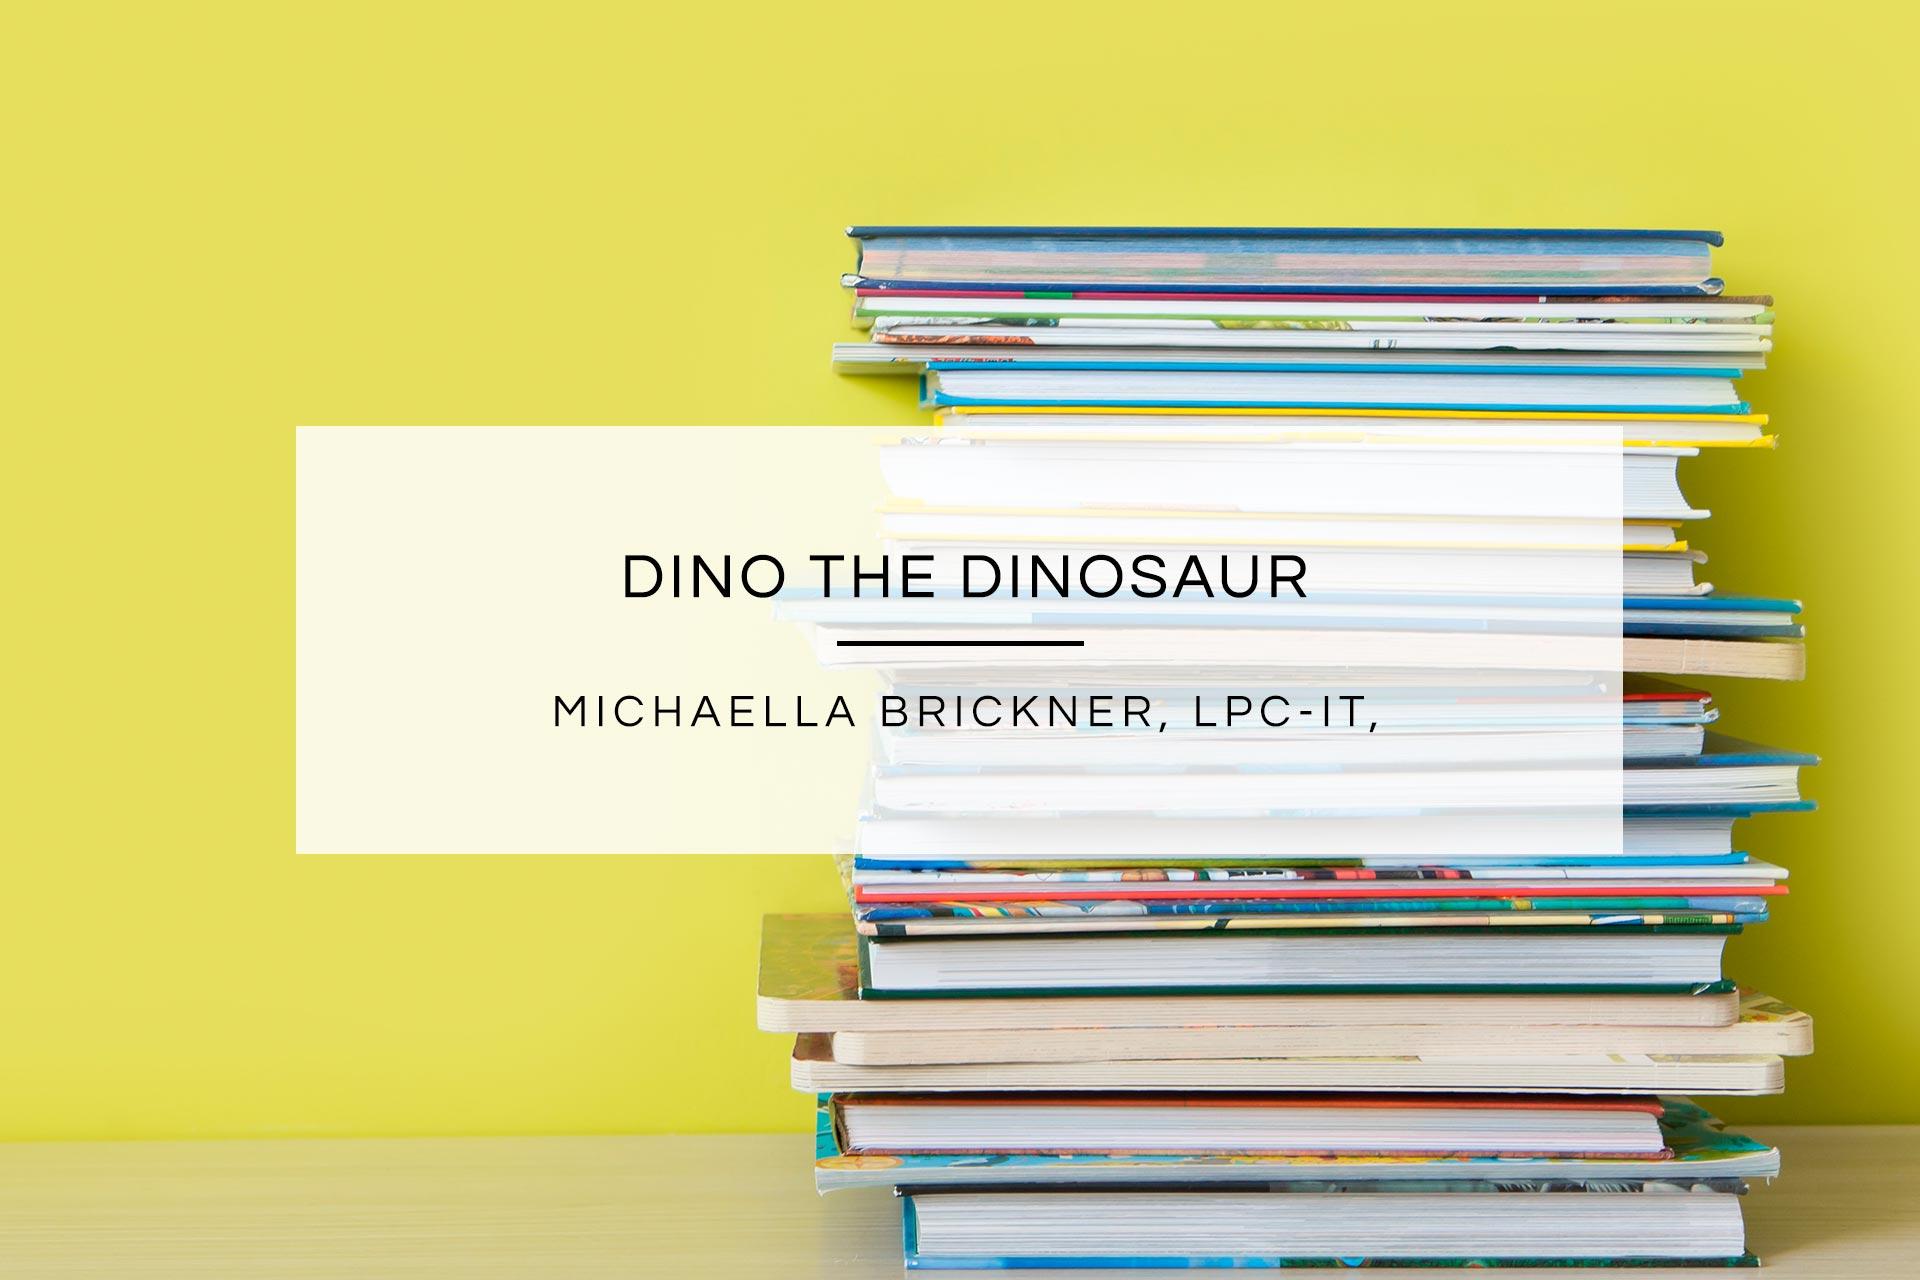 Dino The Dinosaur | Penfield Children's Center